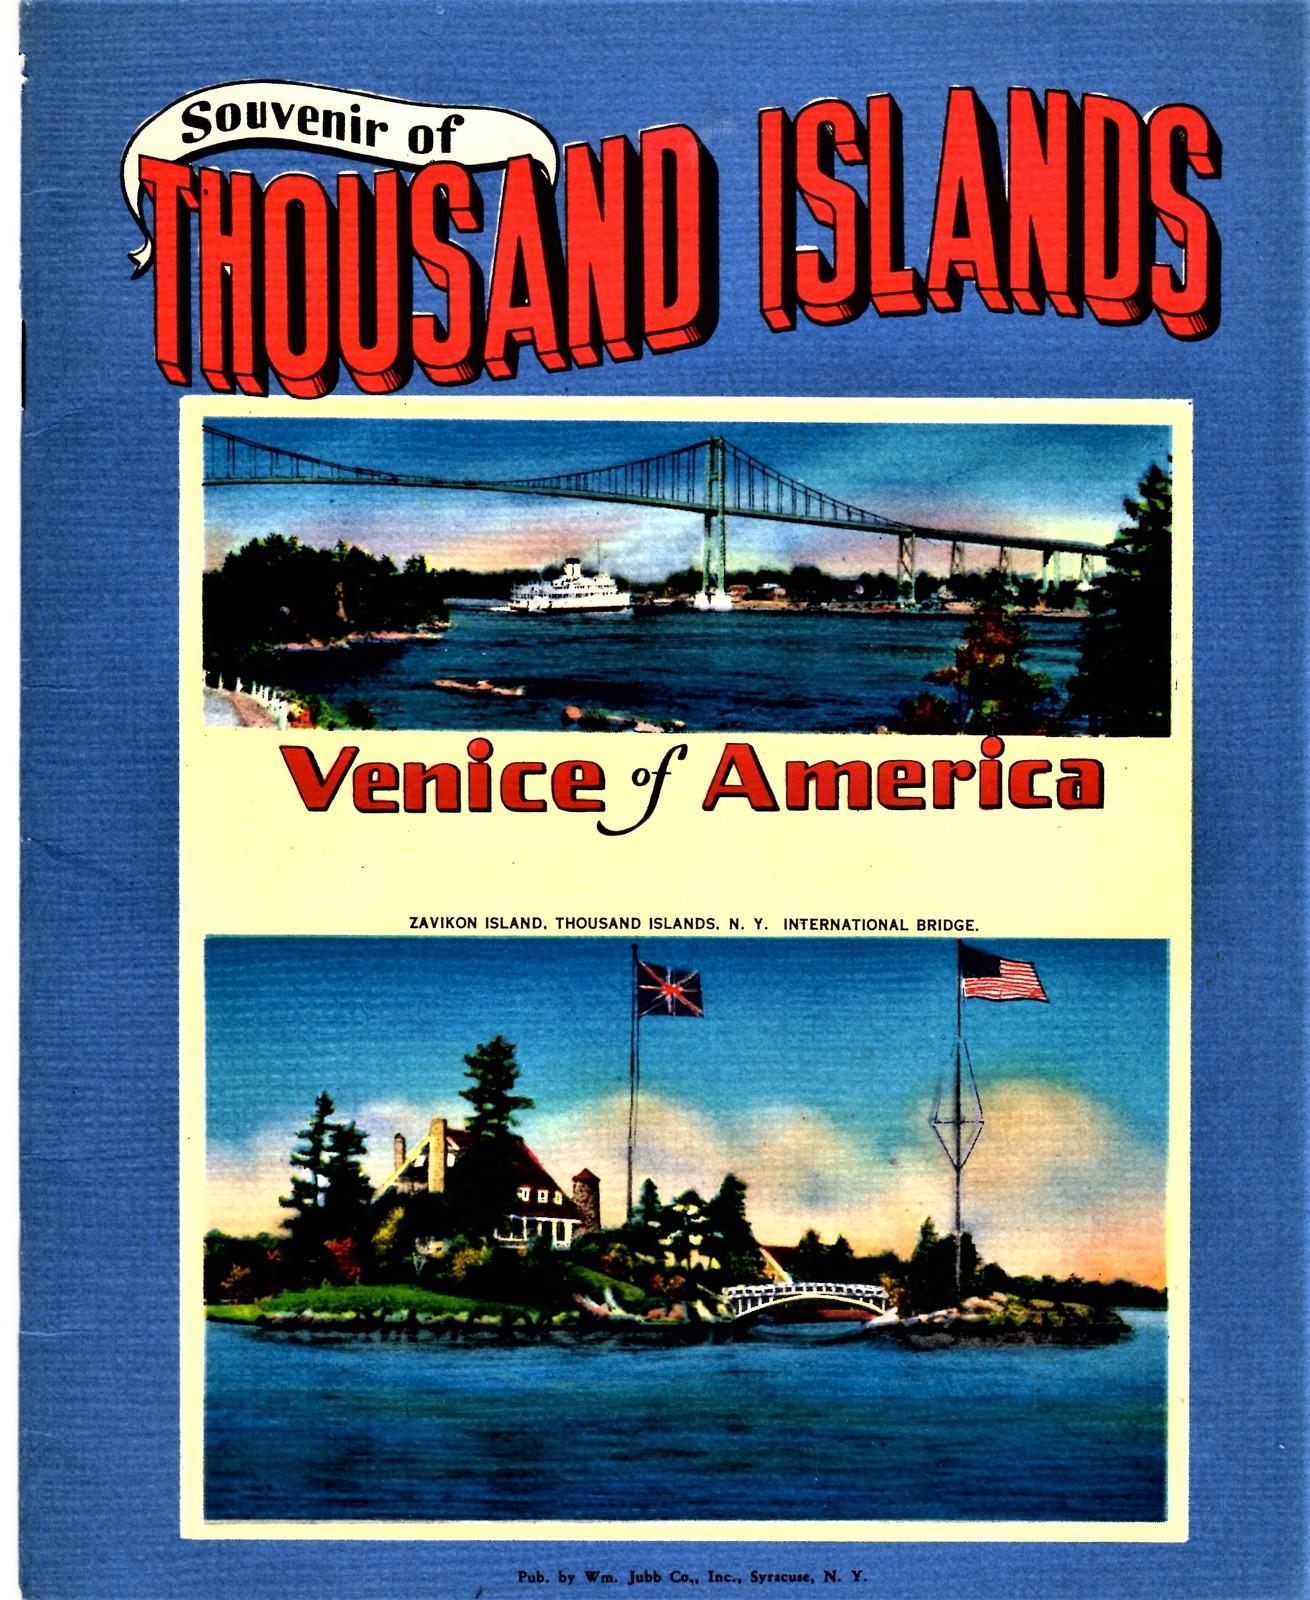 Thousand Islands Venice Of America Book & Souvenir Photo Booklet image 3